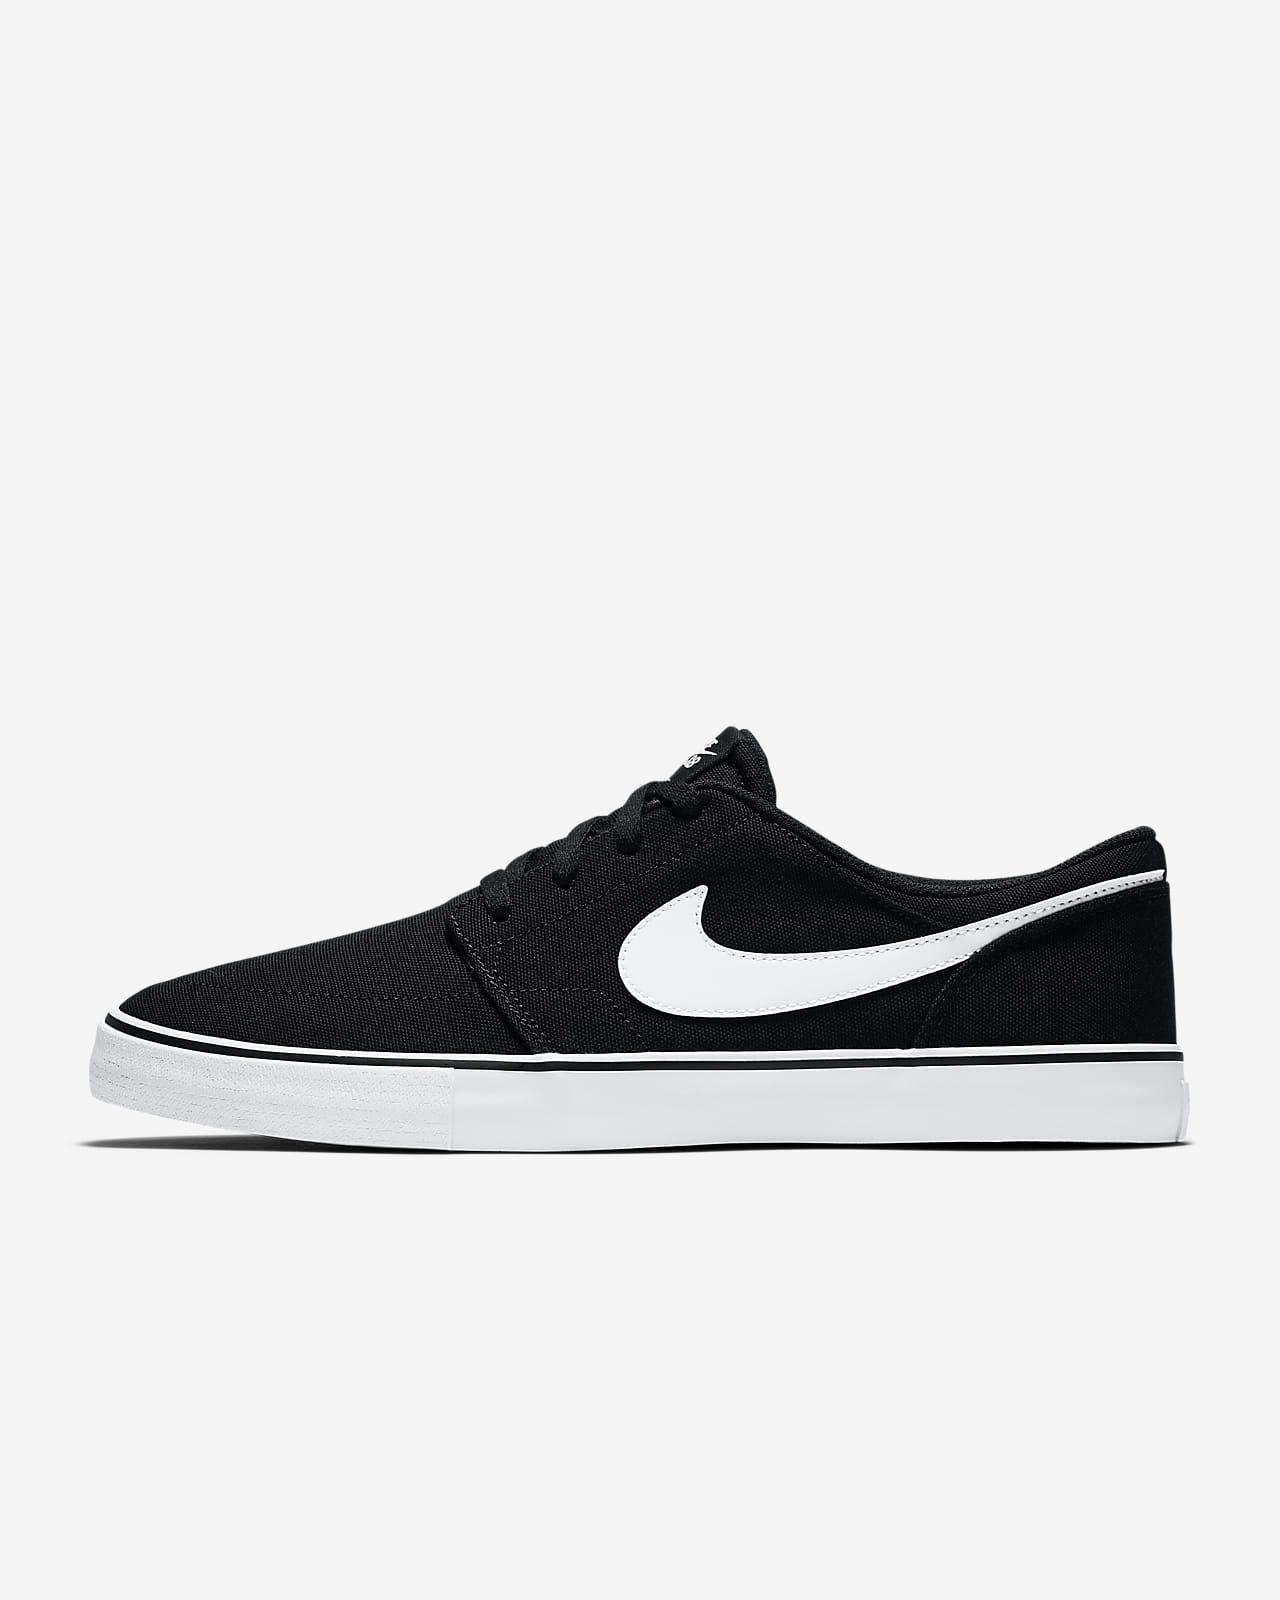 Nike SB Solarsoft Portmore 2 Skate Shoe